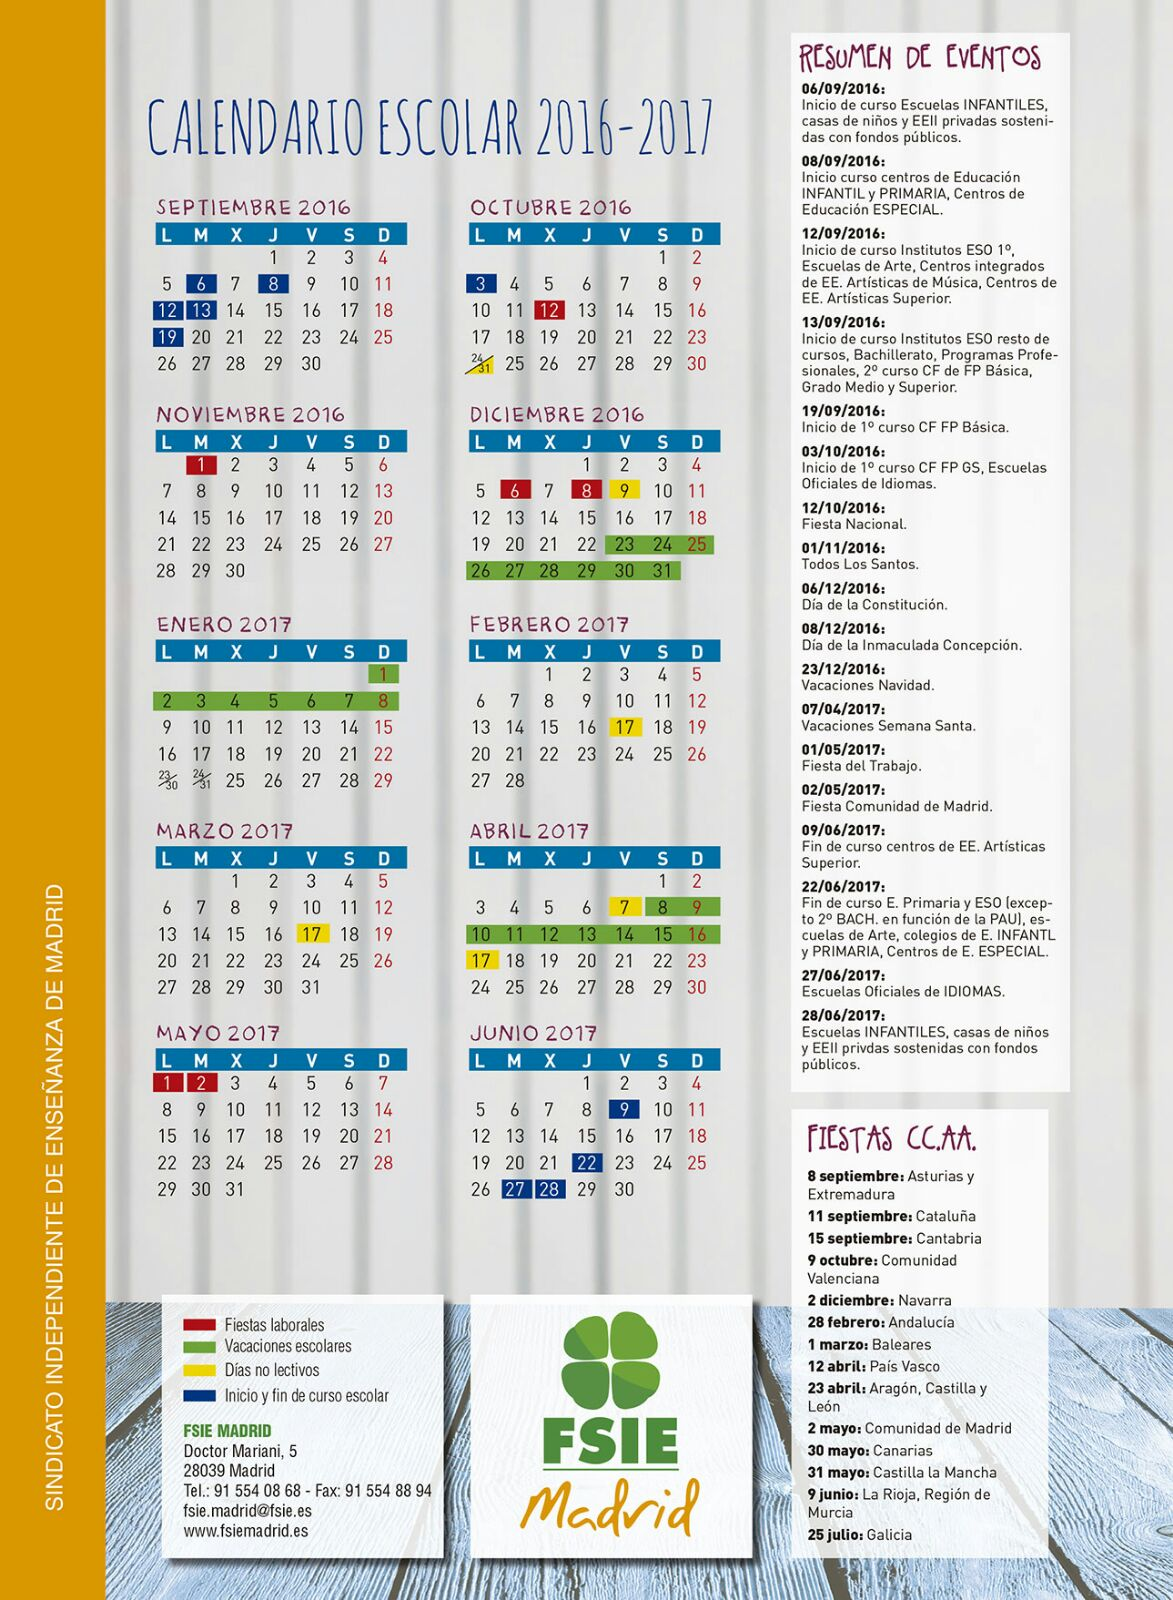 Calendario Escolar Madrid.Calendario Escolar Para El Curso 2016 2017 Fsie Madrid